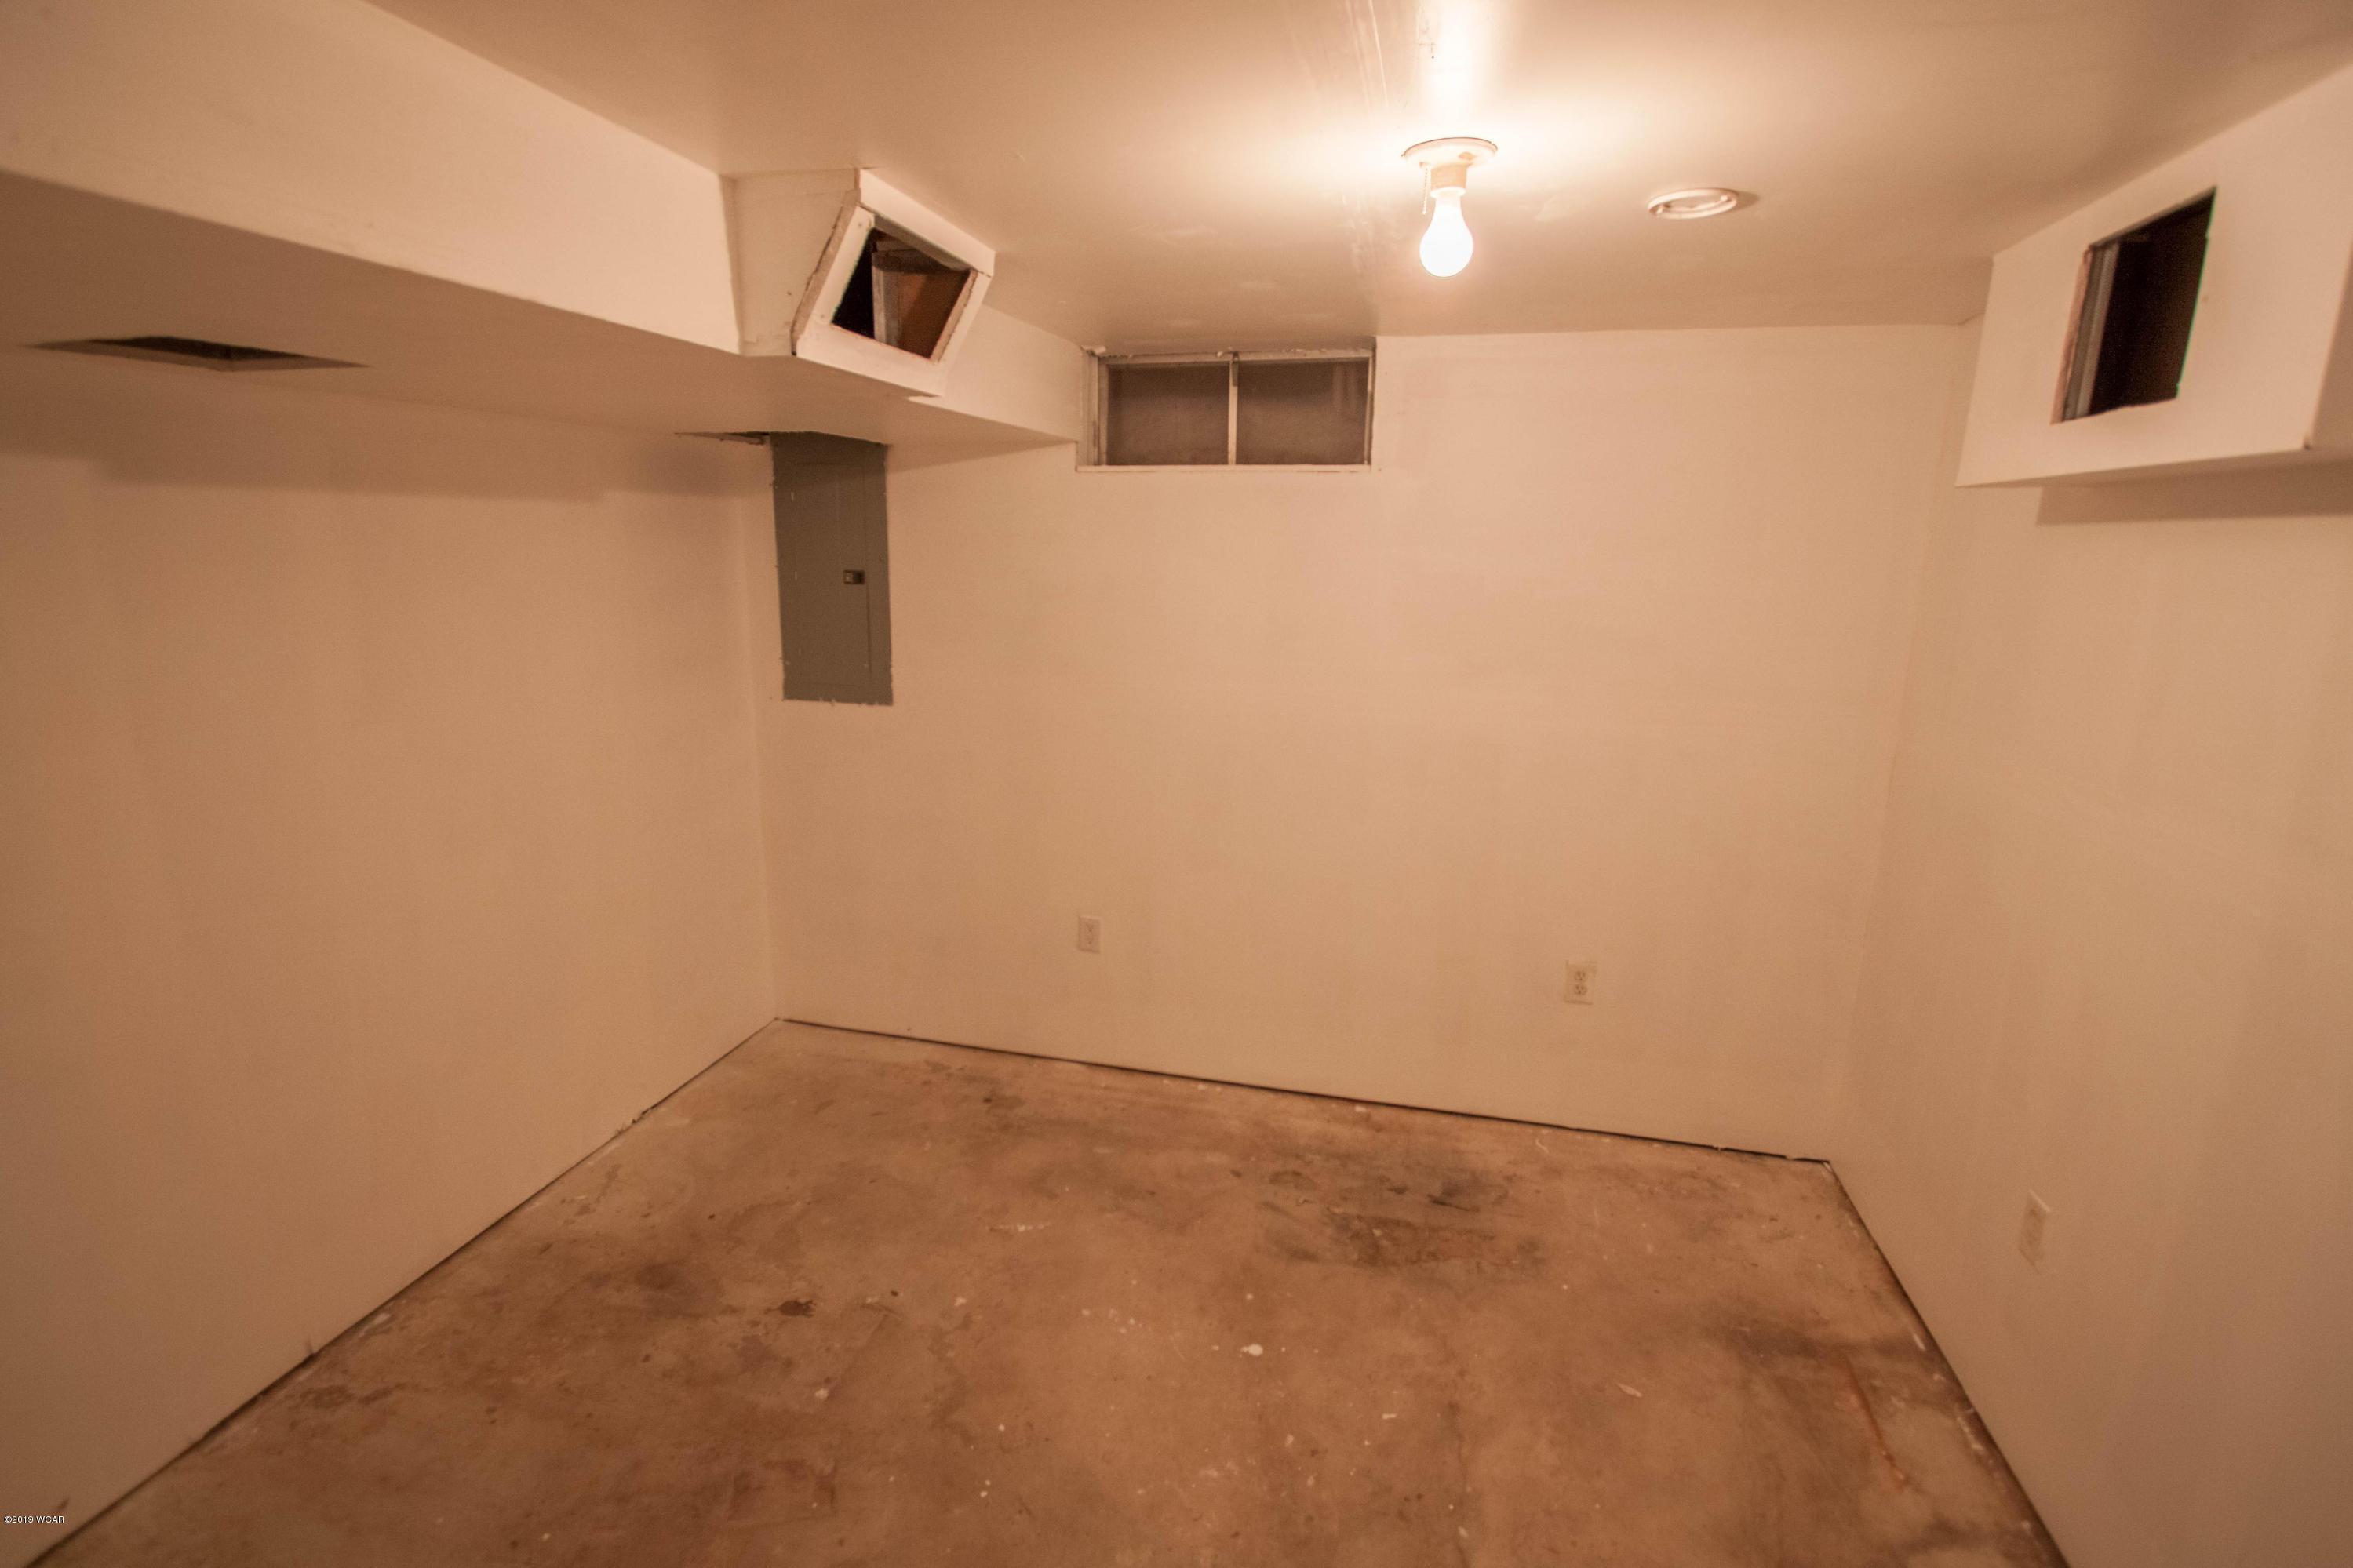 348 SE 14 Street,Willmar,3 Bedrooms Bedrooms,1 BathroomBathrooms,Single Family,SE 14 Street,6033456